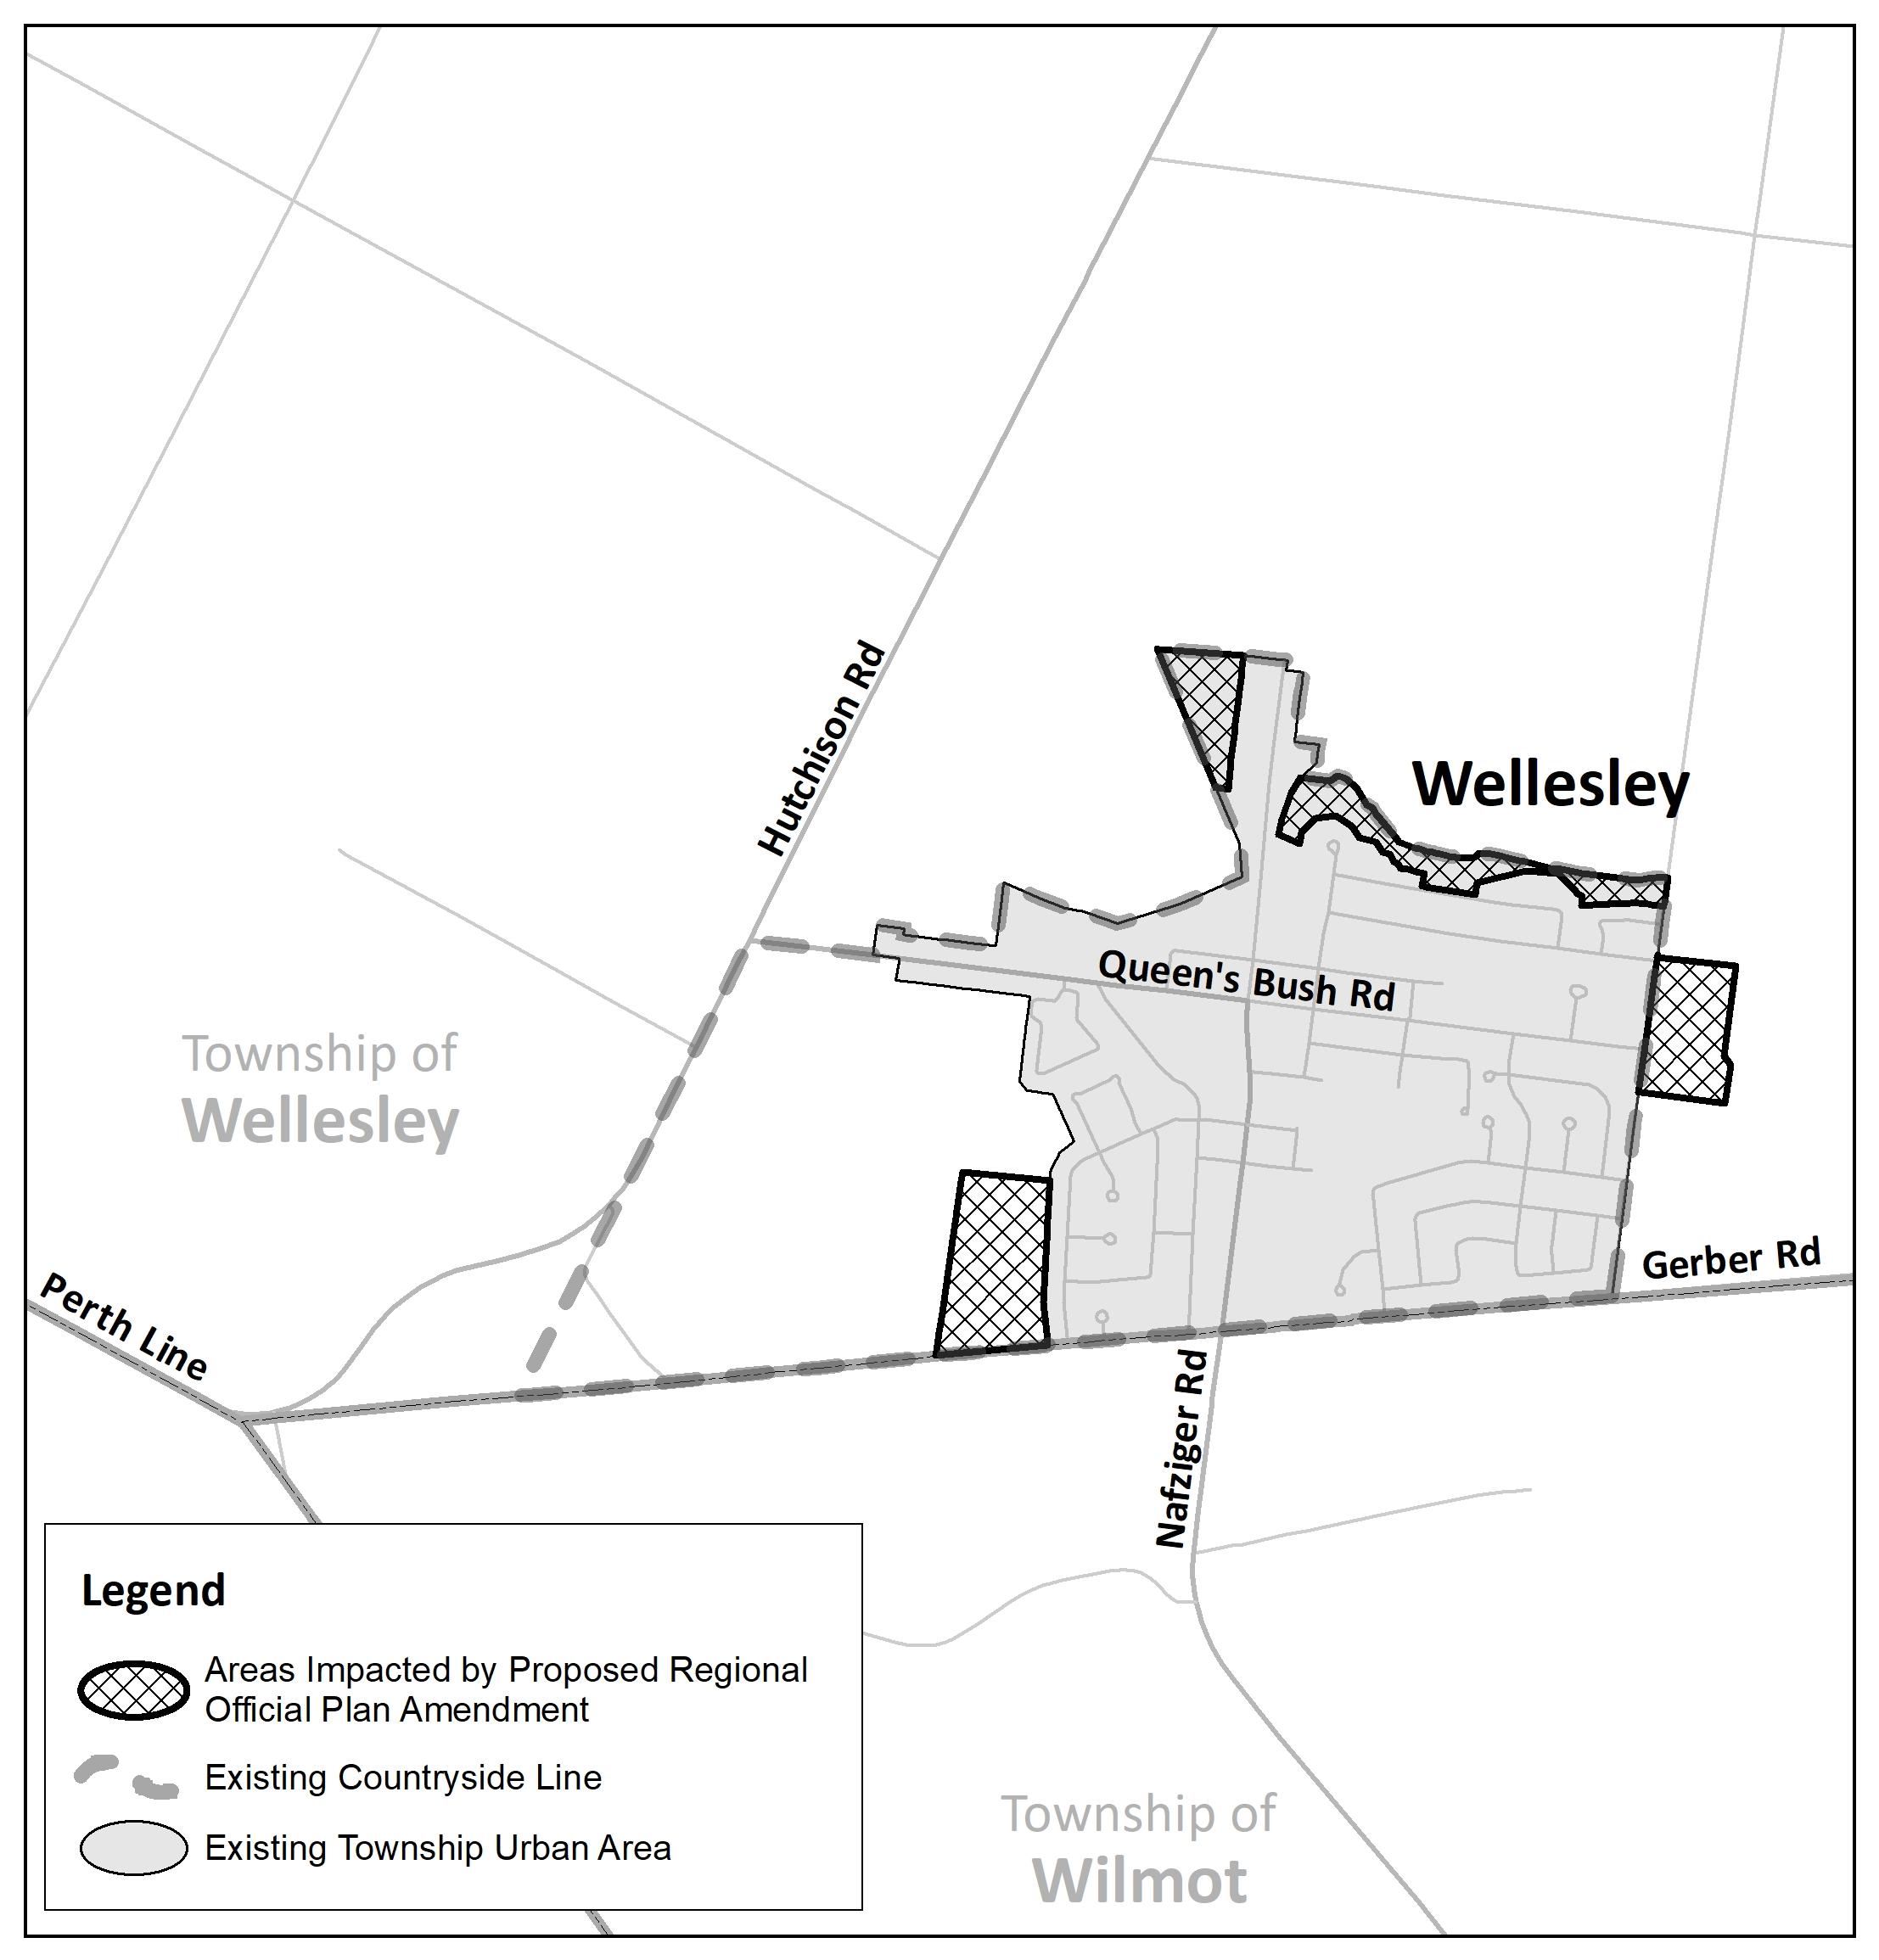 Wellesley Map